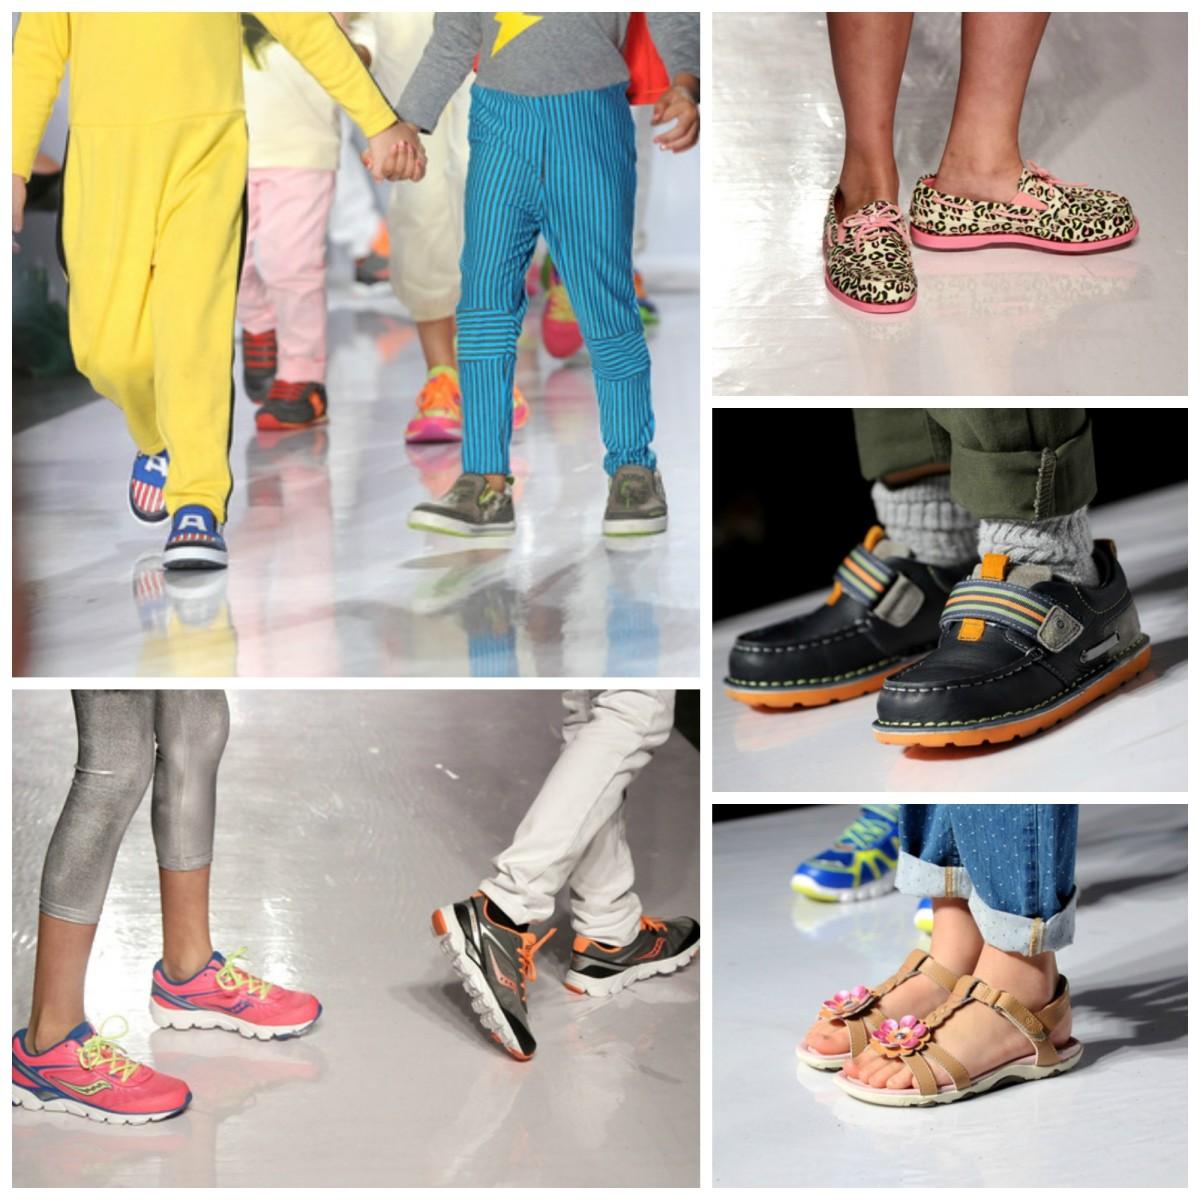 petite parade, kids fashions